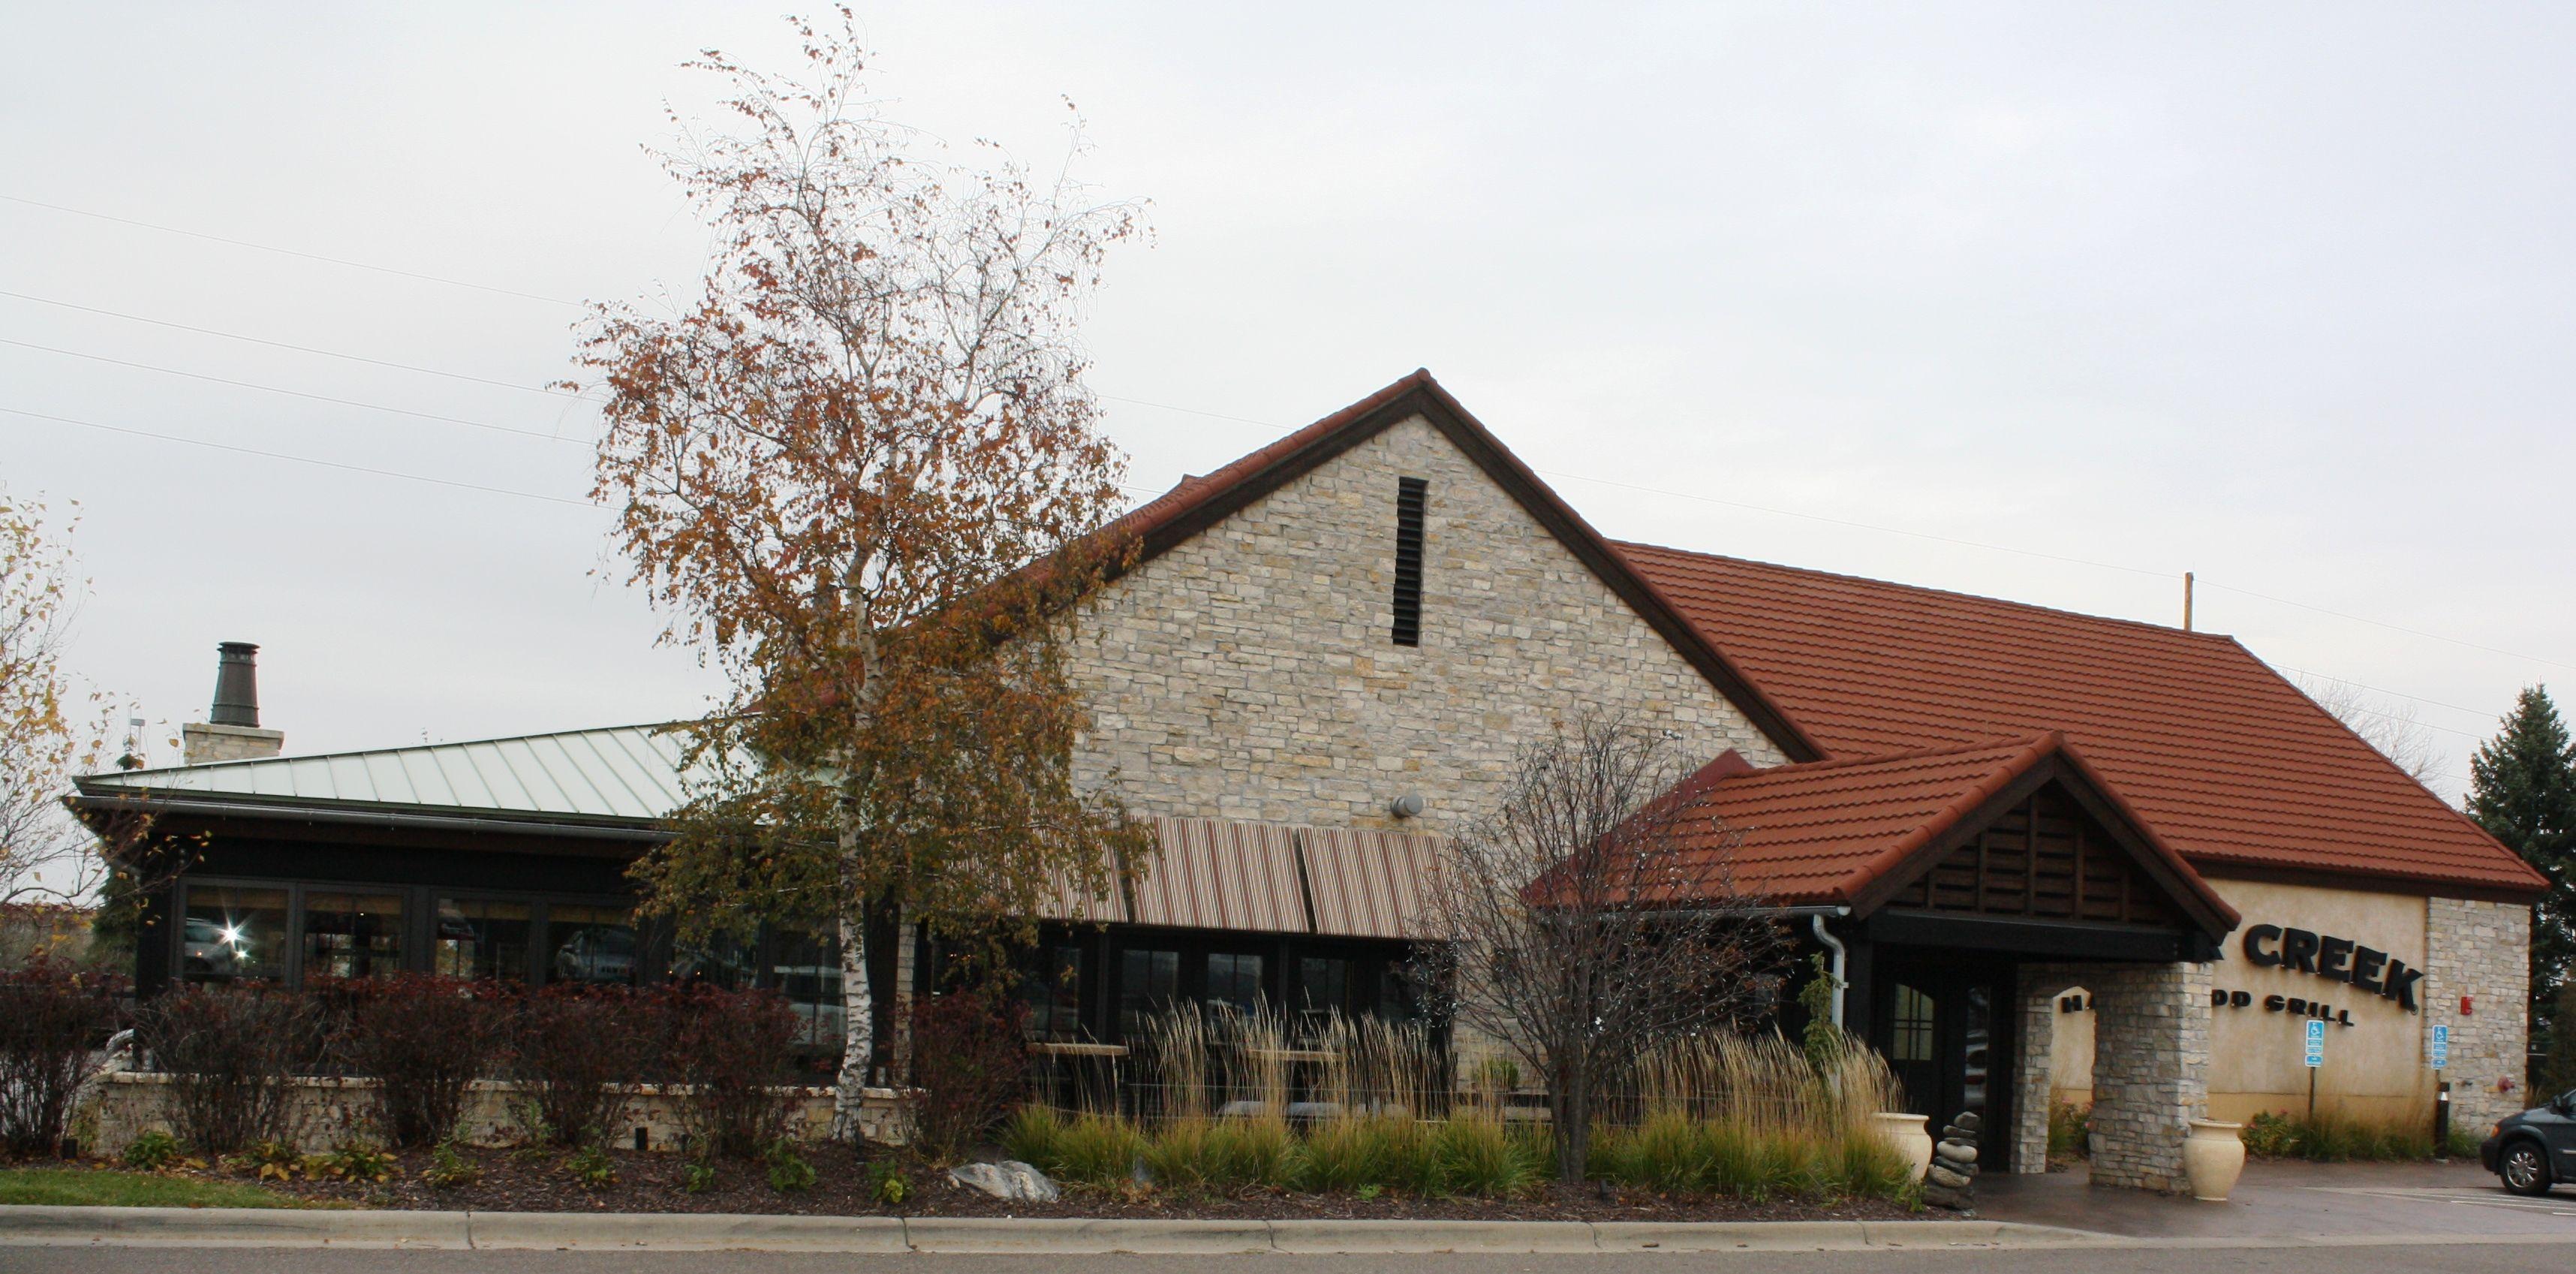 Porter Creek Hardwood Grill. 14201 Burngarten Drive